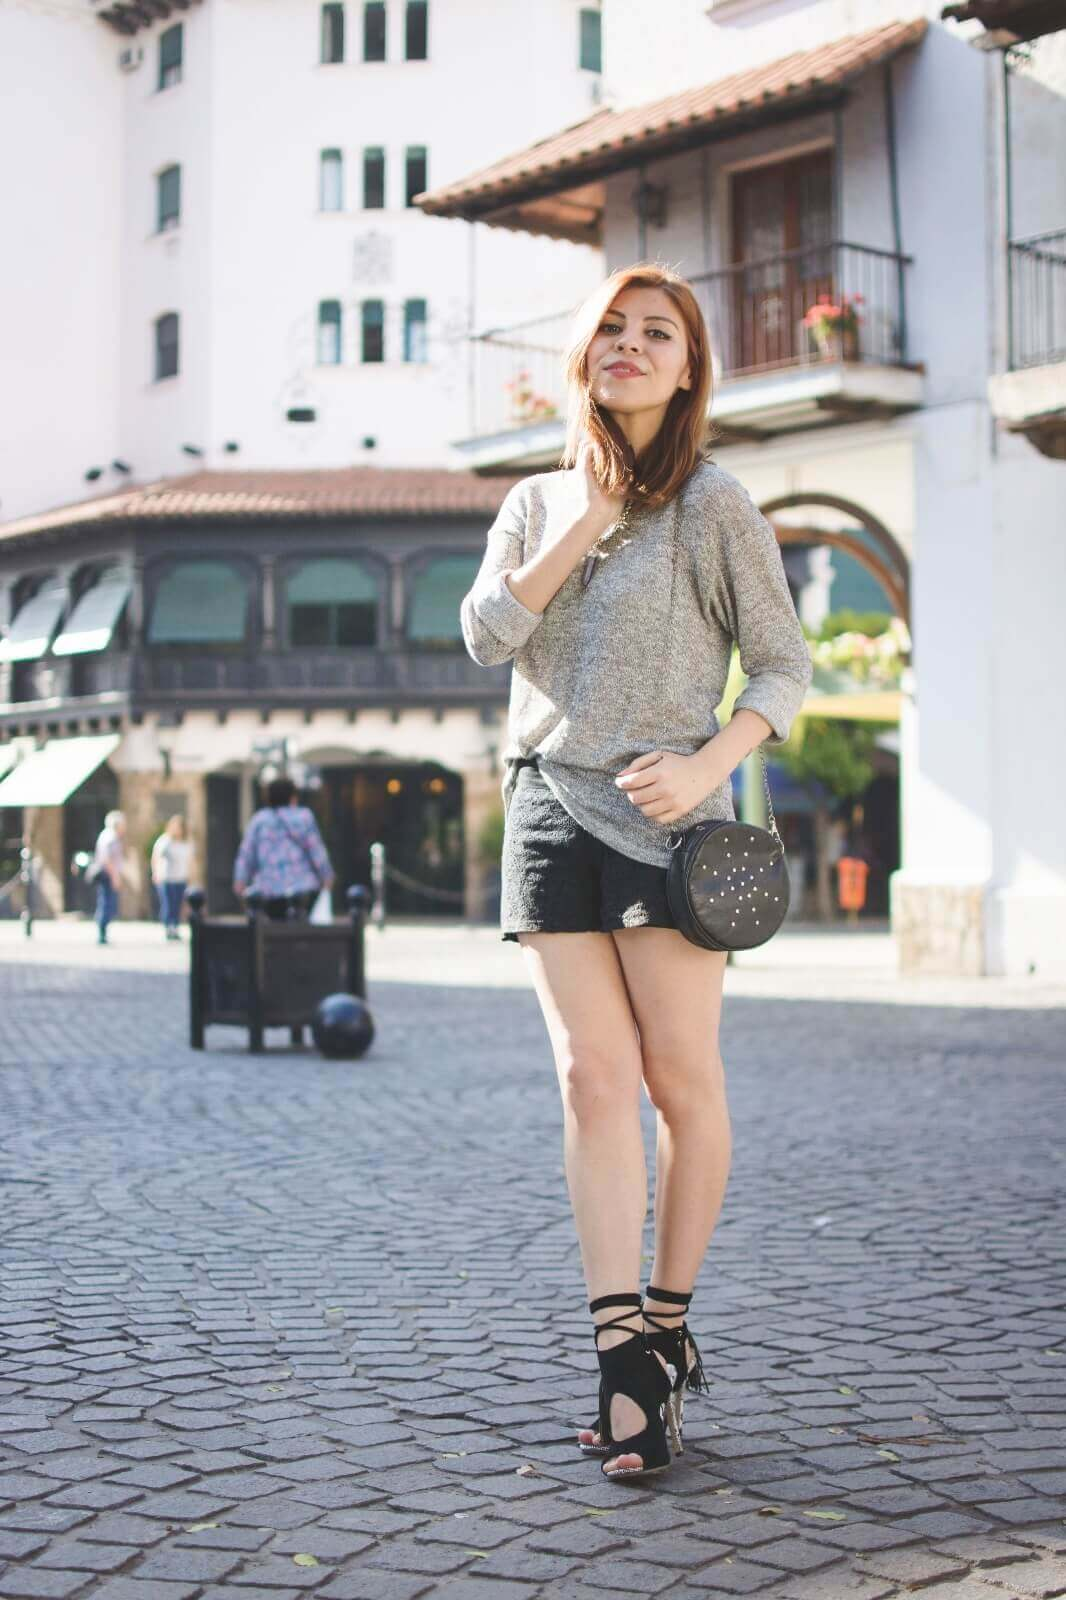 zaful-statement-shoes-silver-mirrored-sunglasses-deborah-ferrero-streetstyle-style-by-deb12